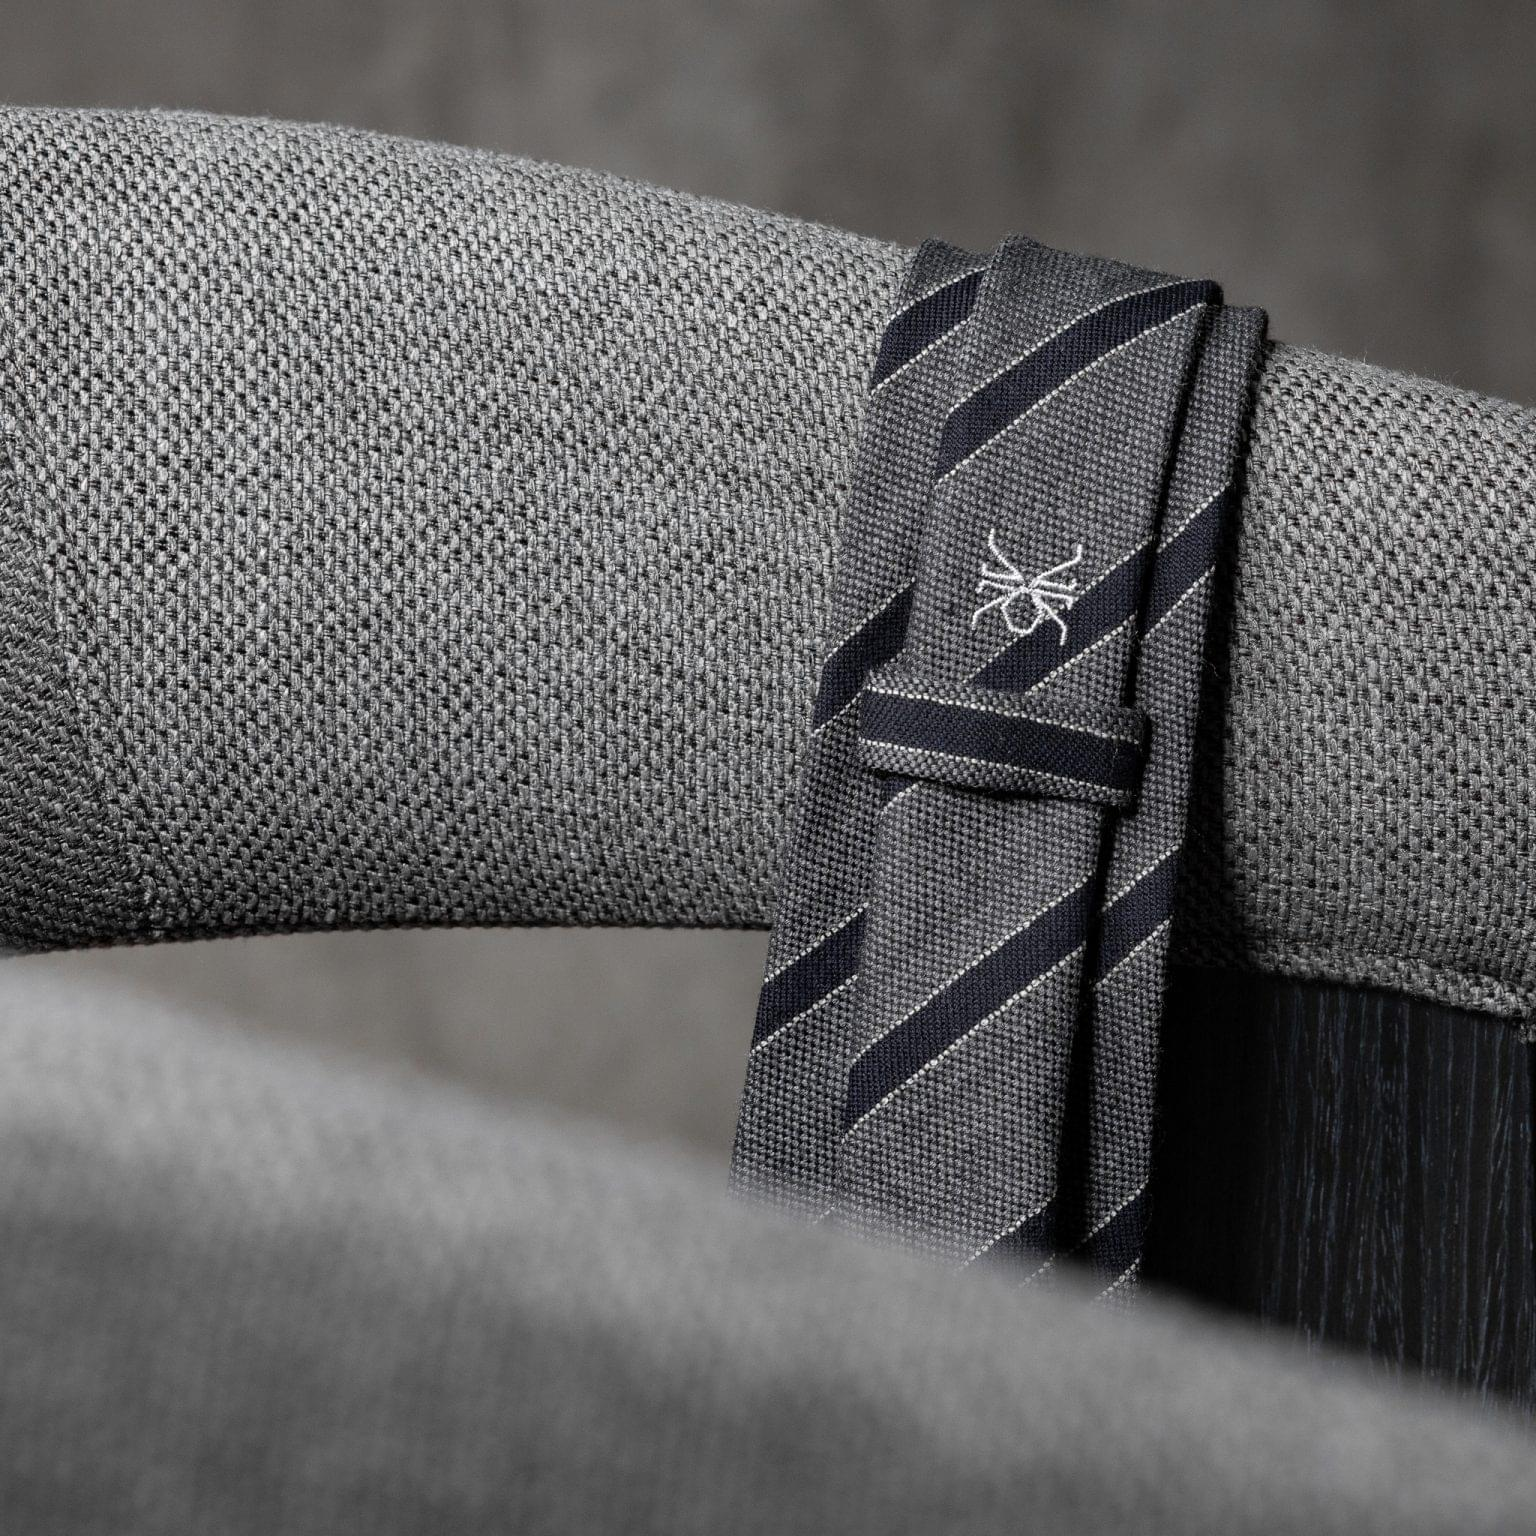 WOOL-LANA-0513-Tie-Initials-Corbata-Iniciales-The-Seelk-4